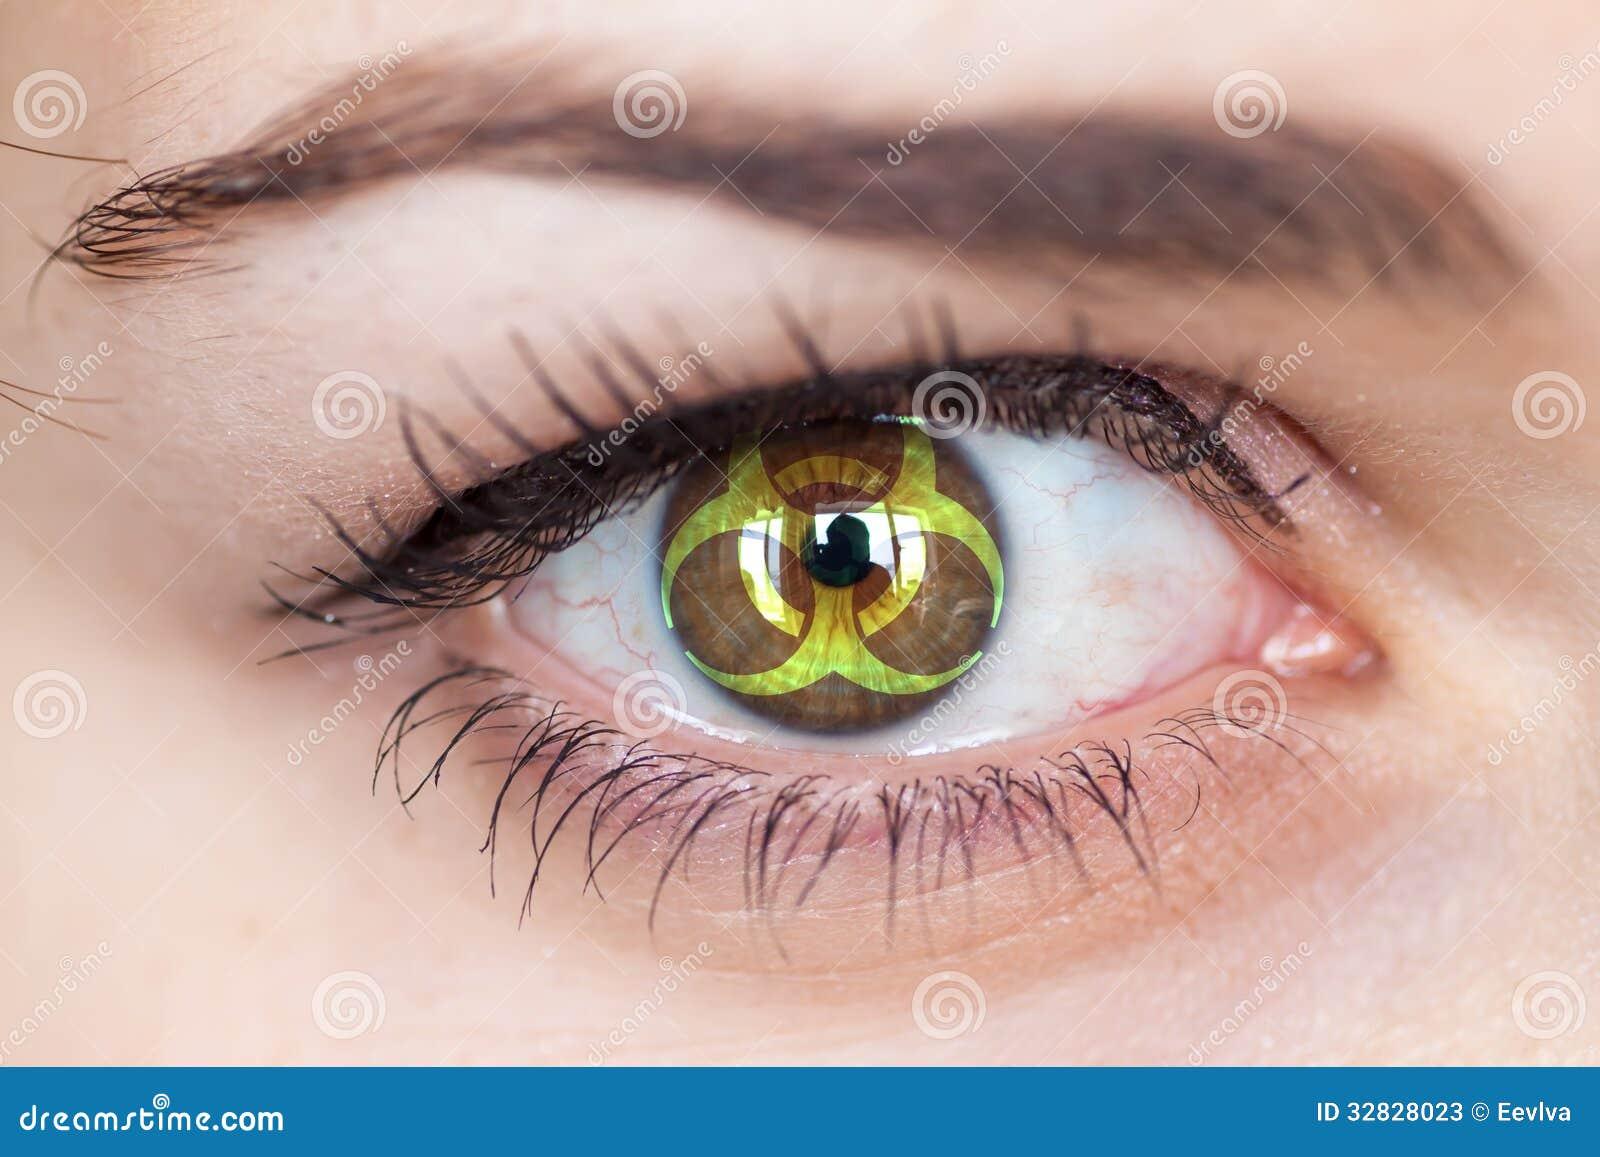 Eye with biohazard symbol